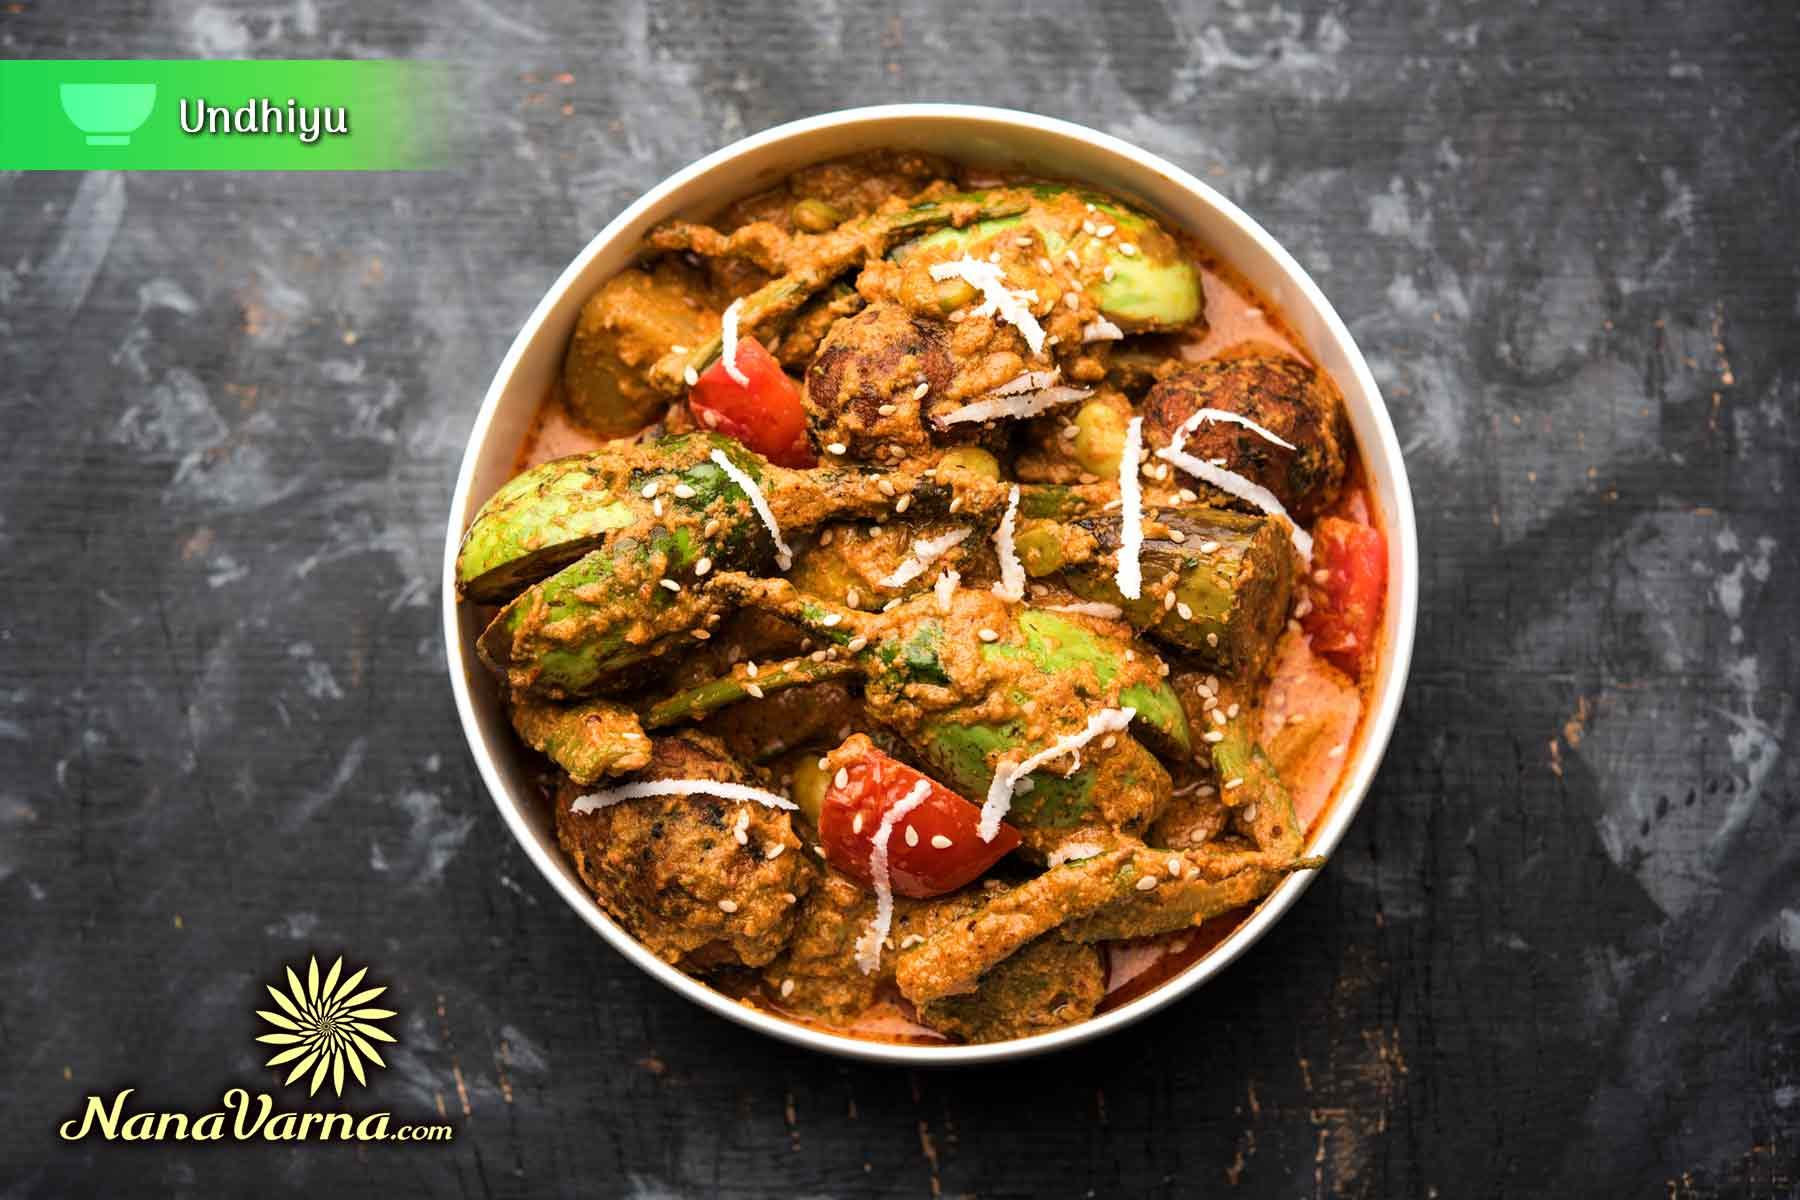 Healthy Indian Food 18